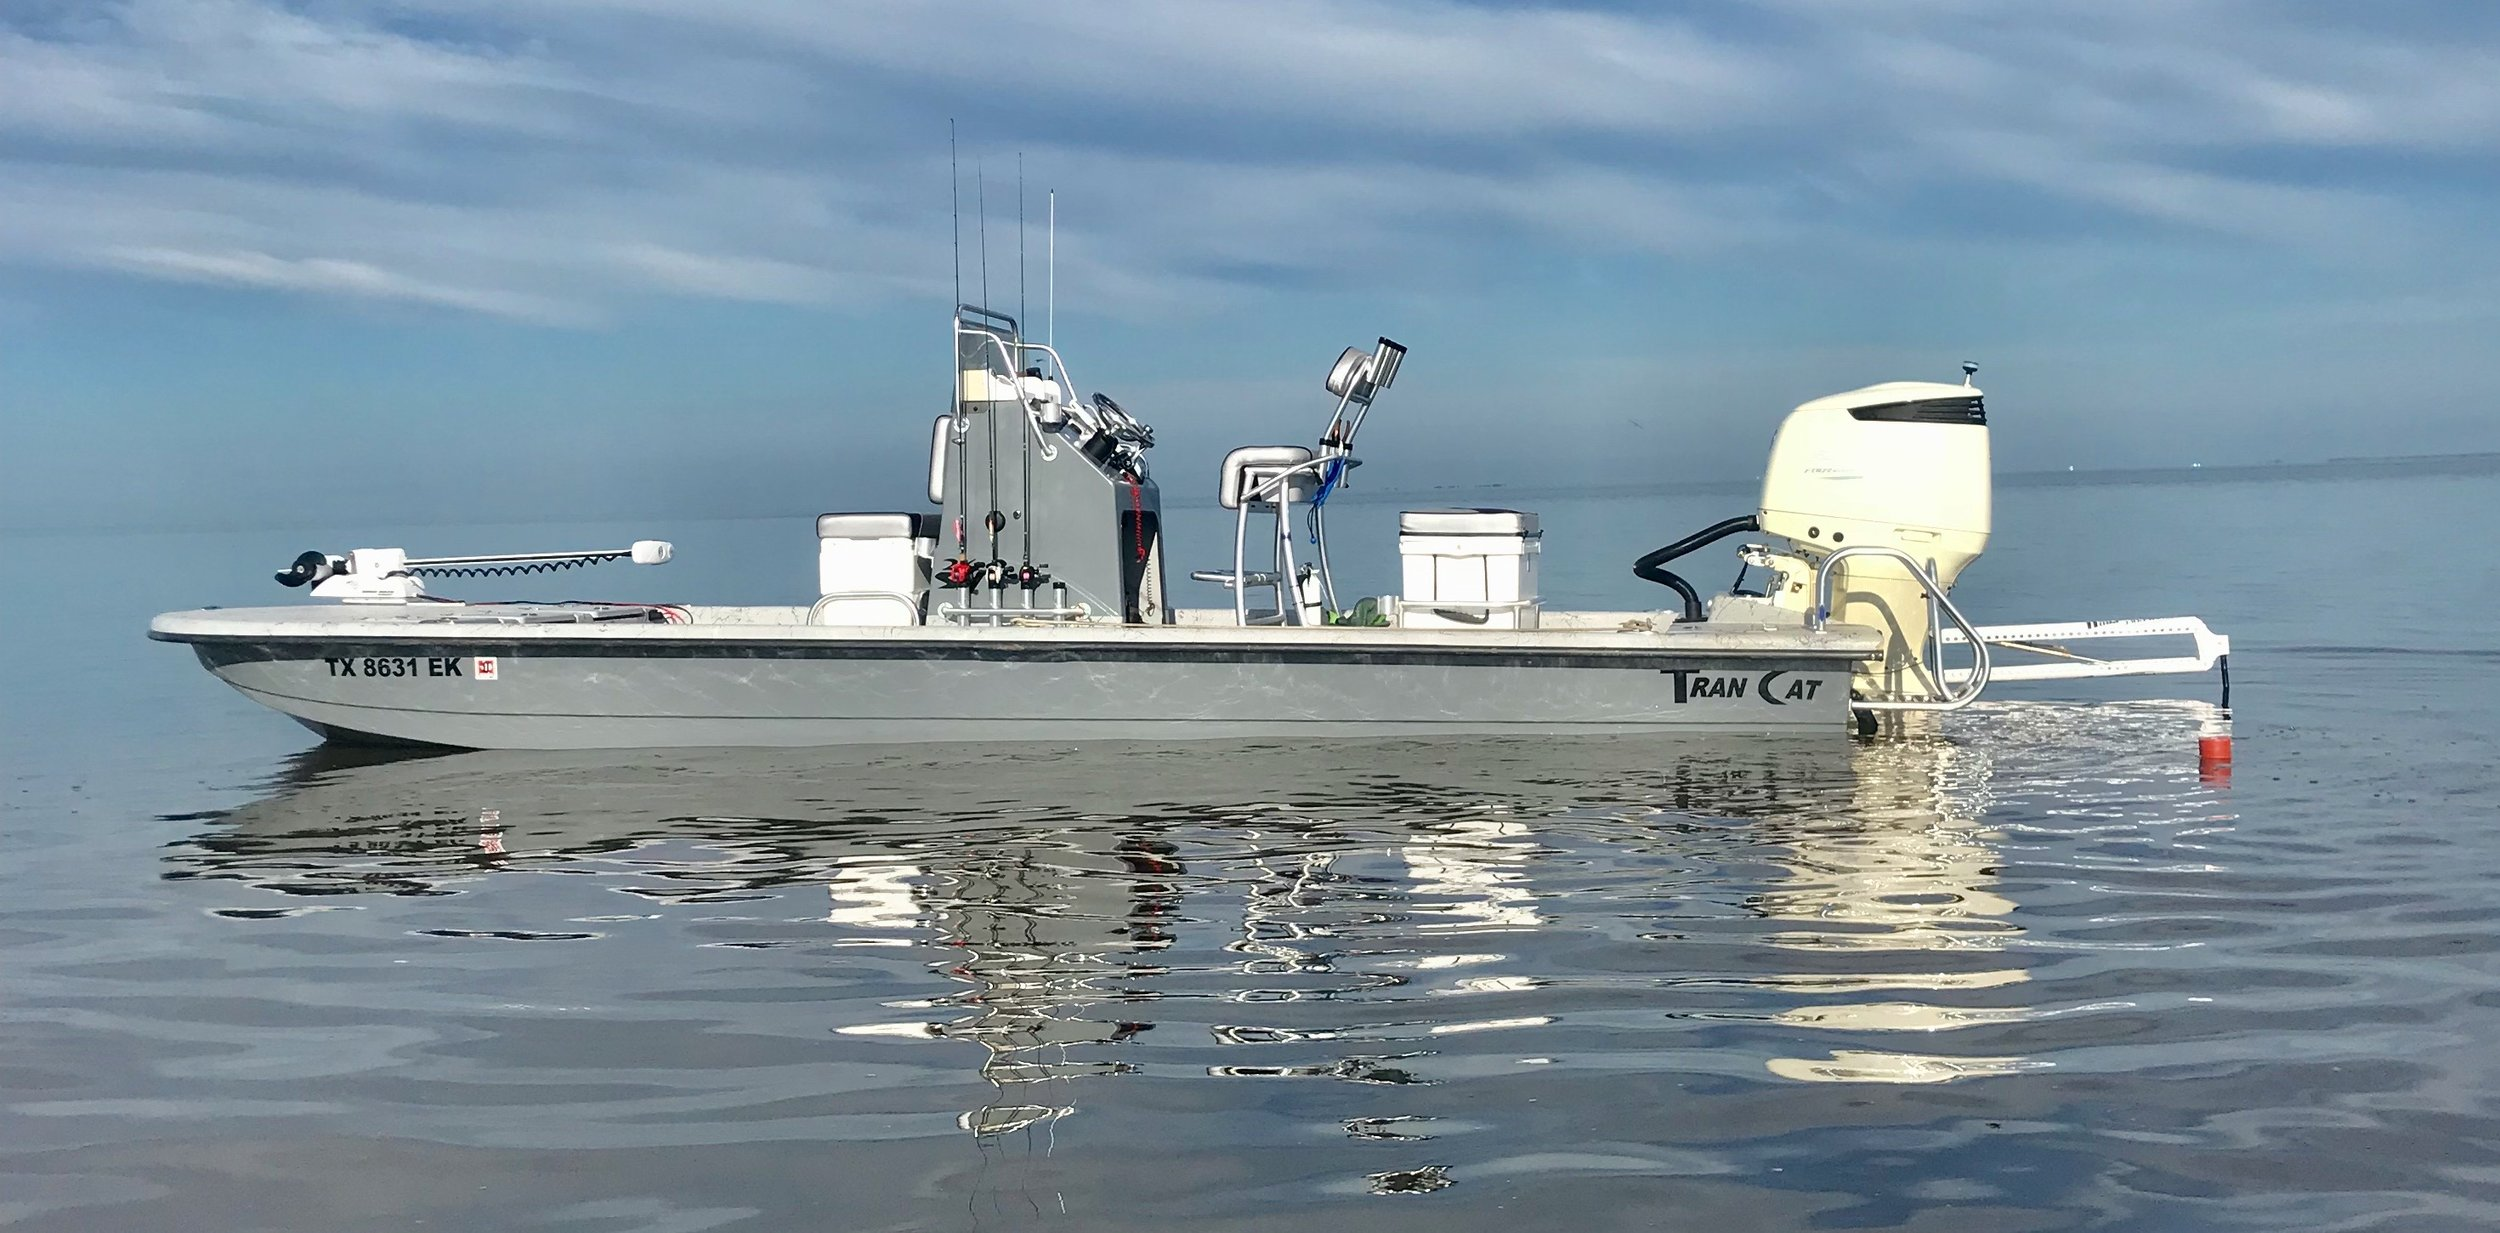 stannewboat2.JPG